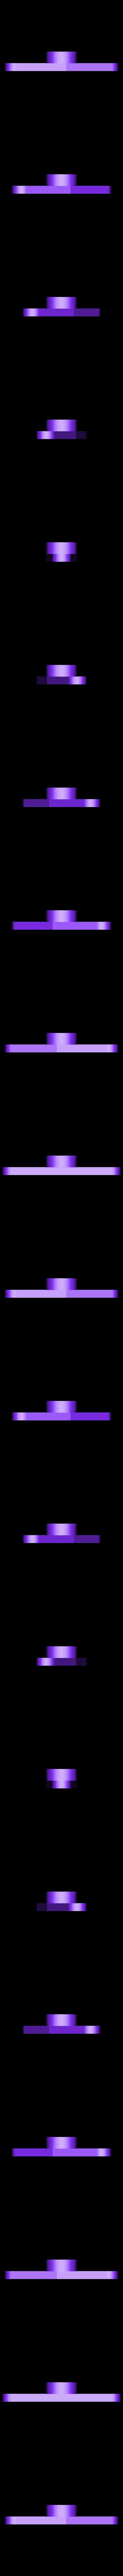 servo_arm_botwg.stl Download free STL file Guardian Robot Hackable – Bottom Remix • 3D print object, Adafruit